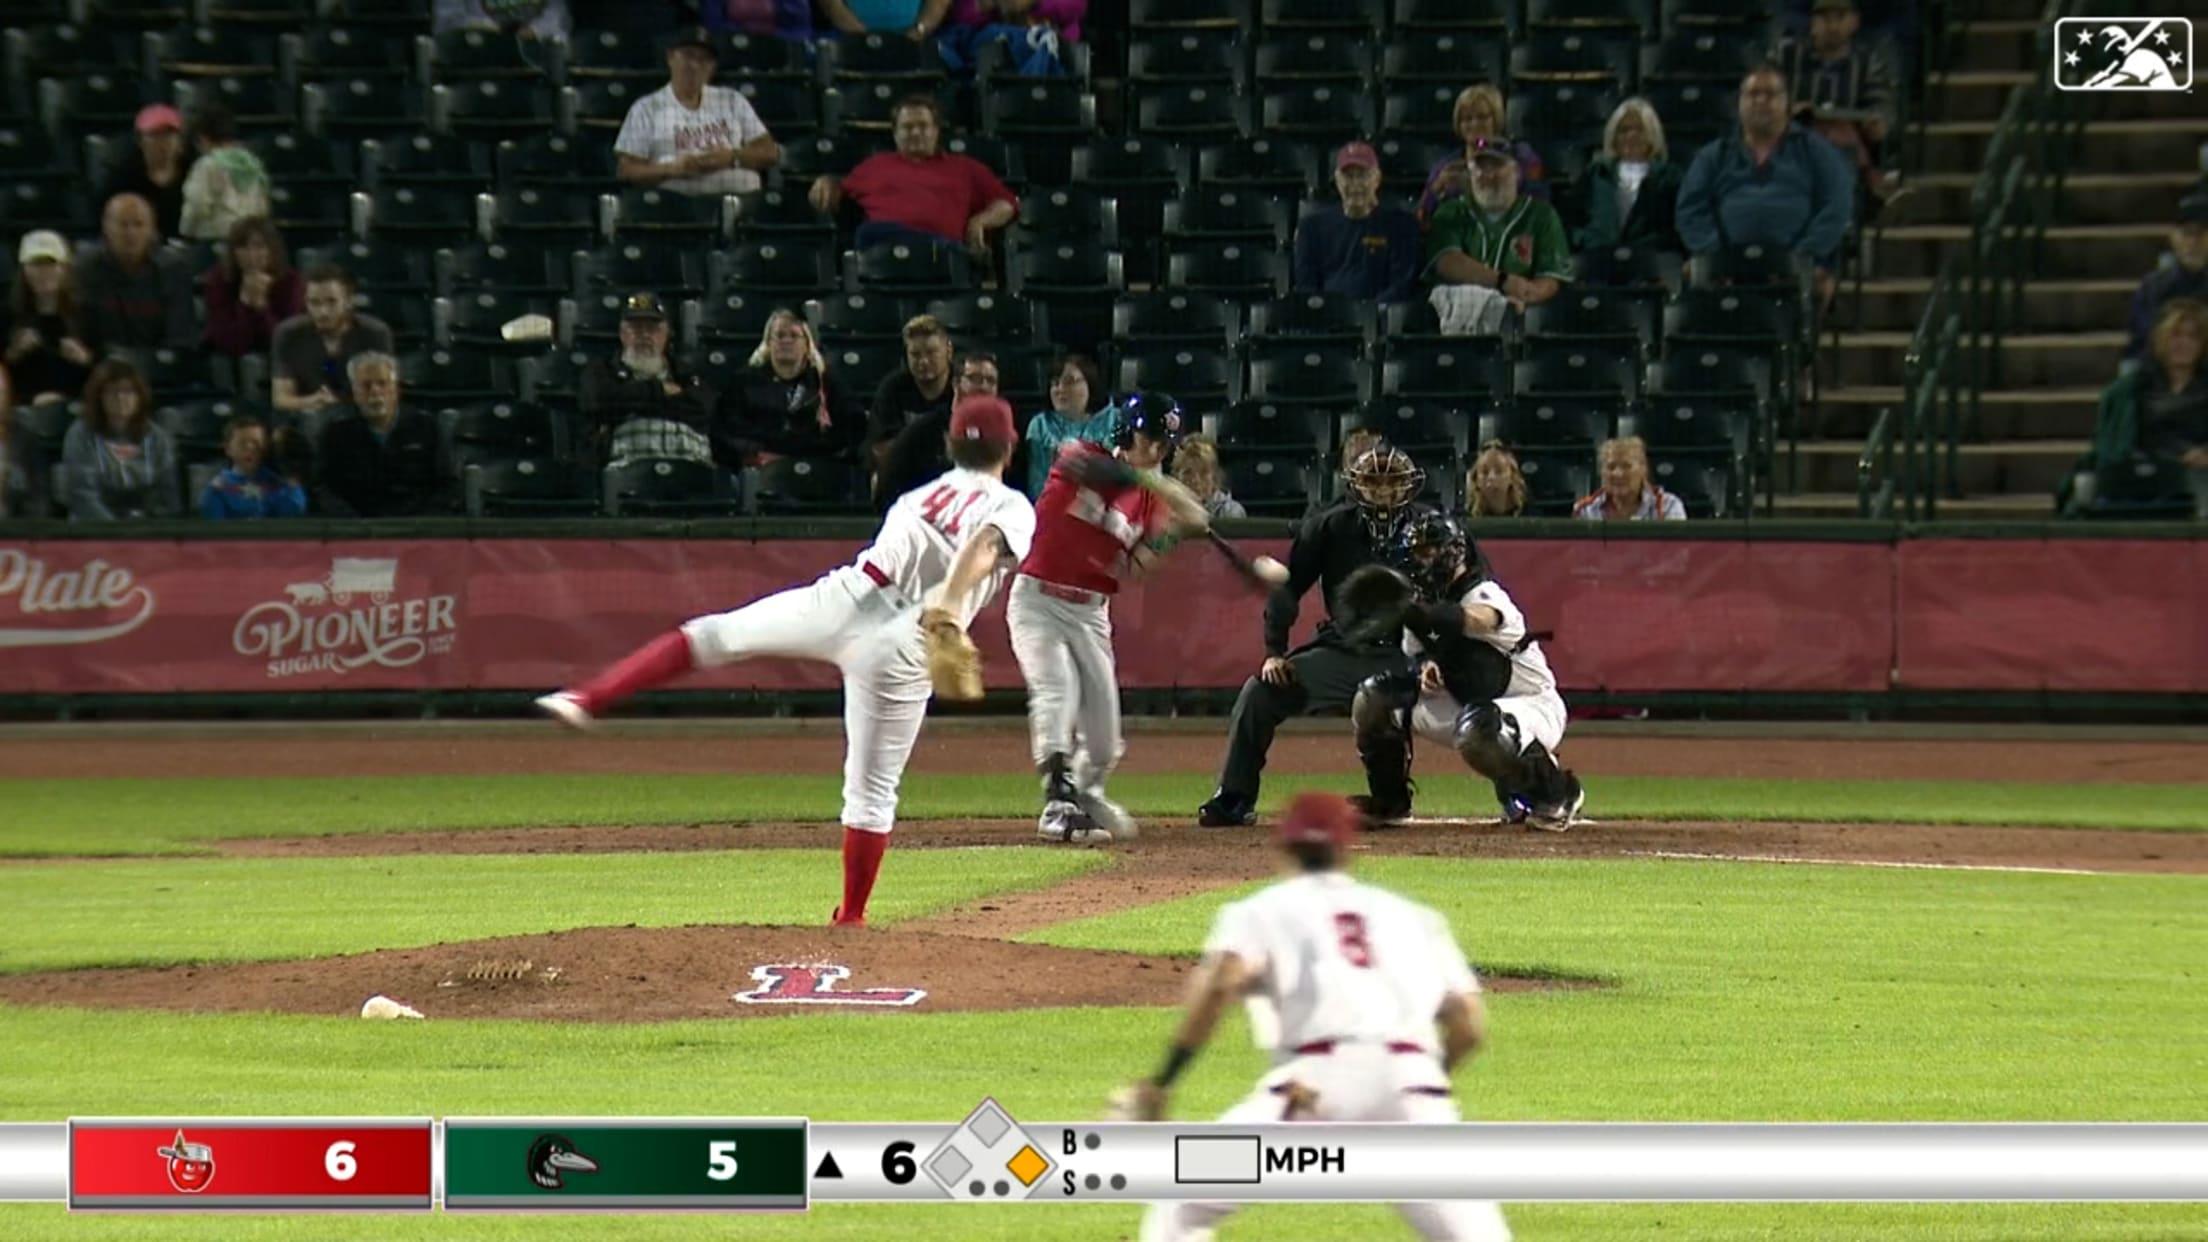 Hassell slugs two home runs